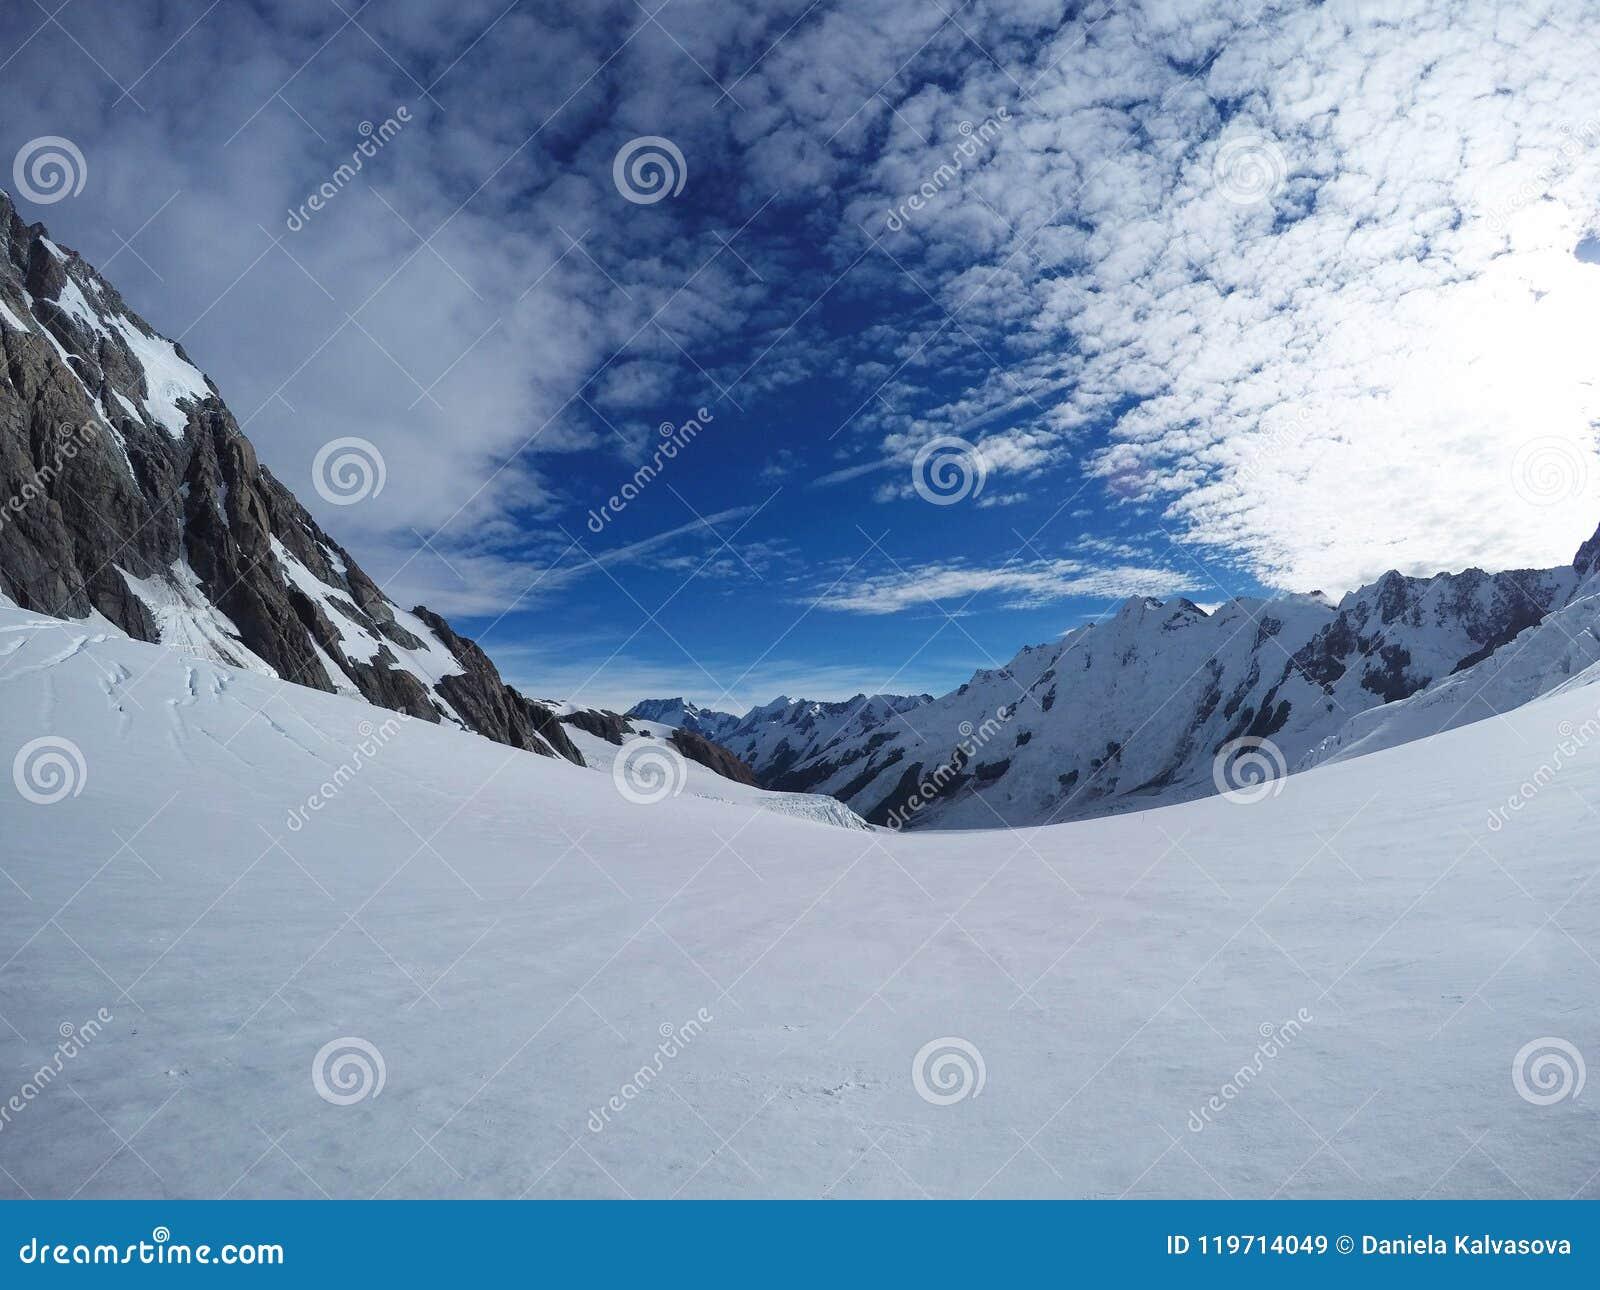 Snow/mountain background for mountain lovers. Contrast of white snow and blue sky on the Tasman Glacier at Aoraki/Mount Cook Natio